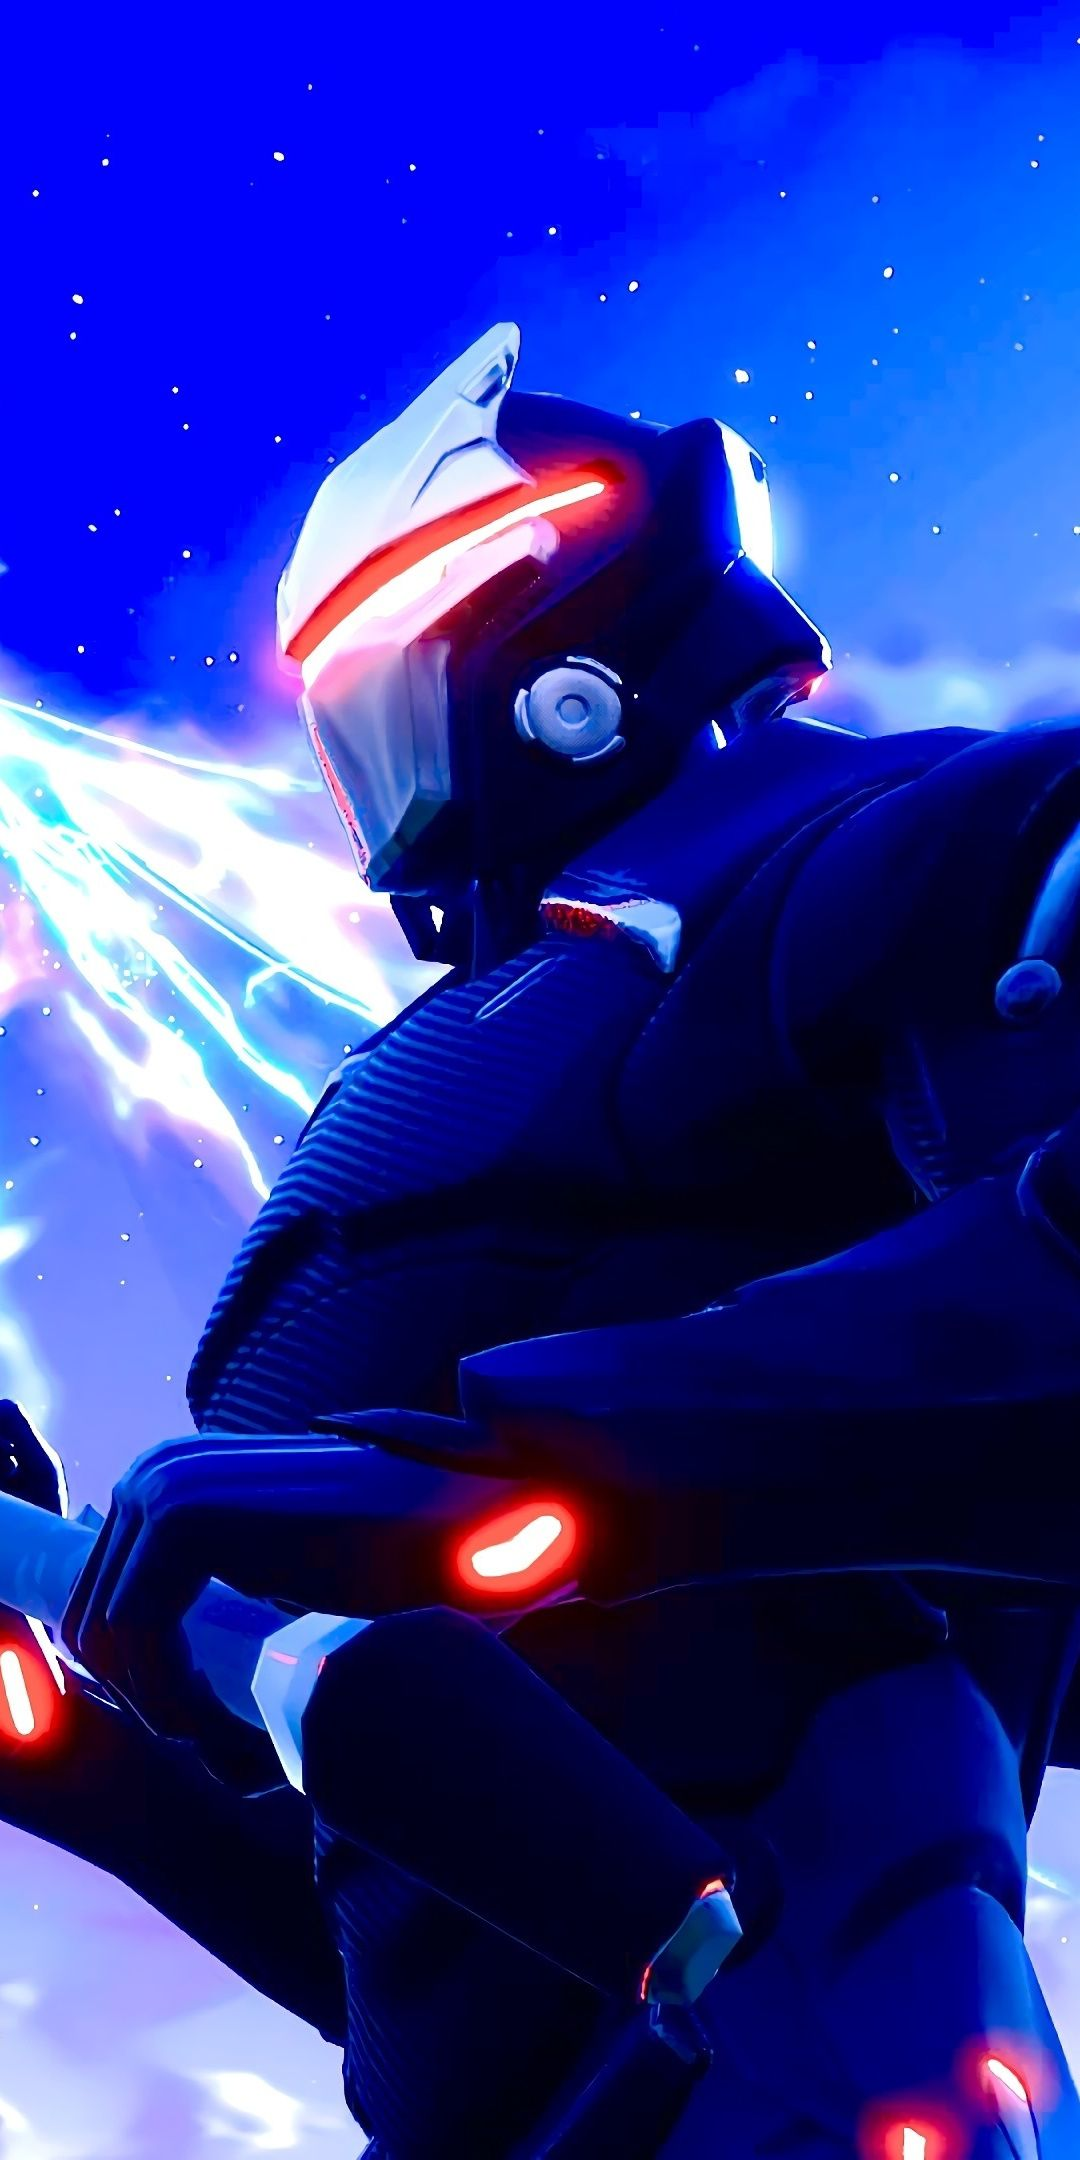 Fortnite, Omega Skill, Video Game, 2018, 1080x2160 Wallpaper